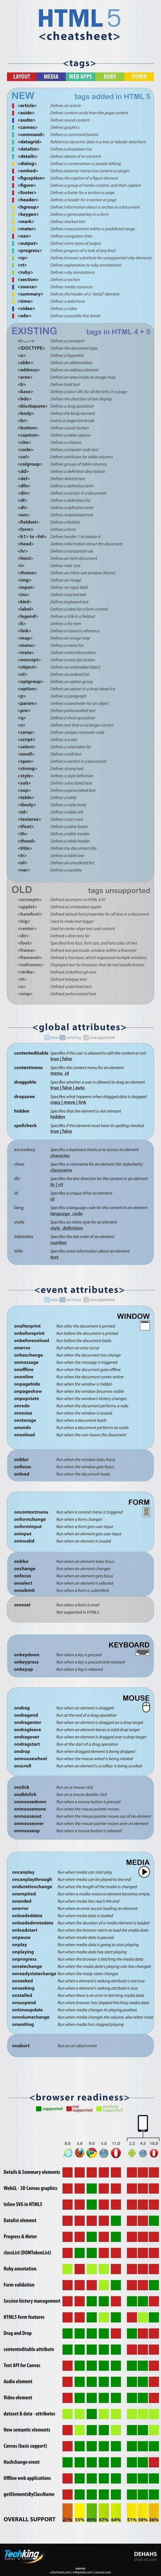 HTML5 Mobile Times | Open Web Platform | Scoop.it